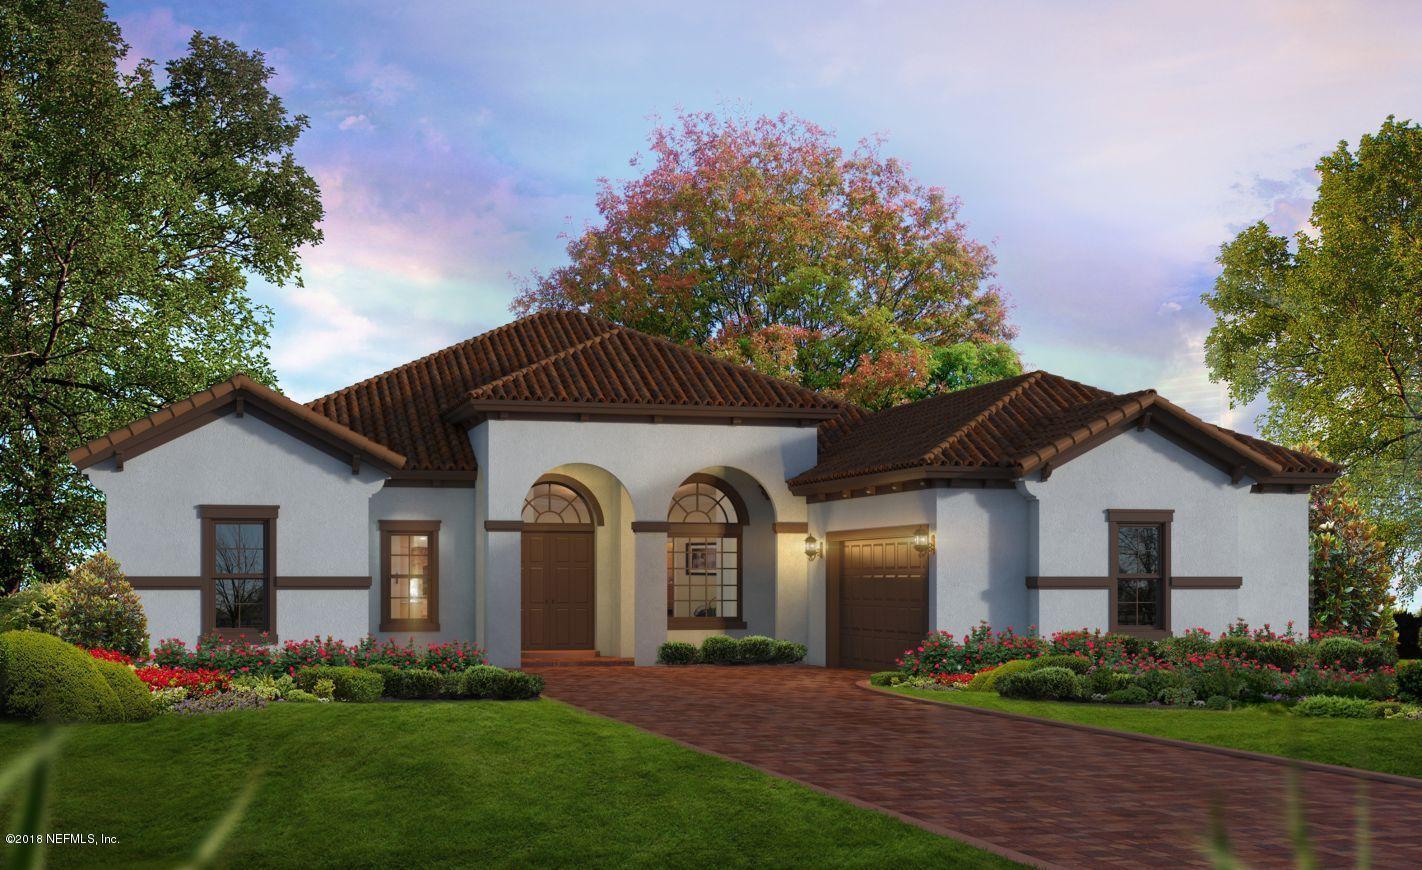 2734 TARTUS, JACKSONVILLE, FLORIDA 32246, 3 Bedrooms Bedrooms, ,3 BathroomsBathrooms,Residential - single family,For sale,TARTUS,952089